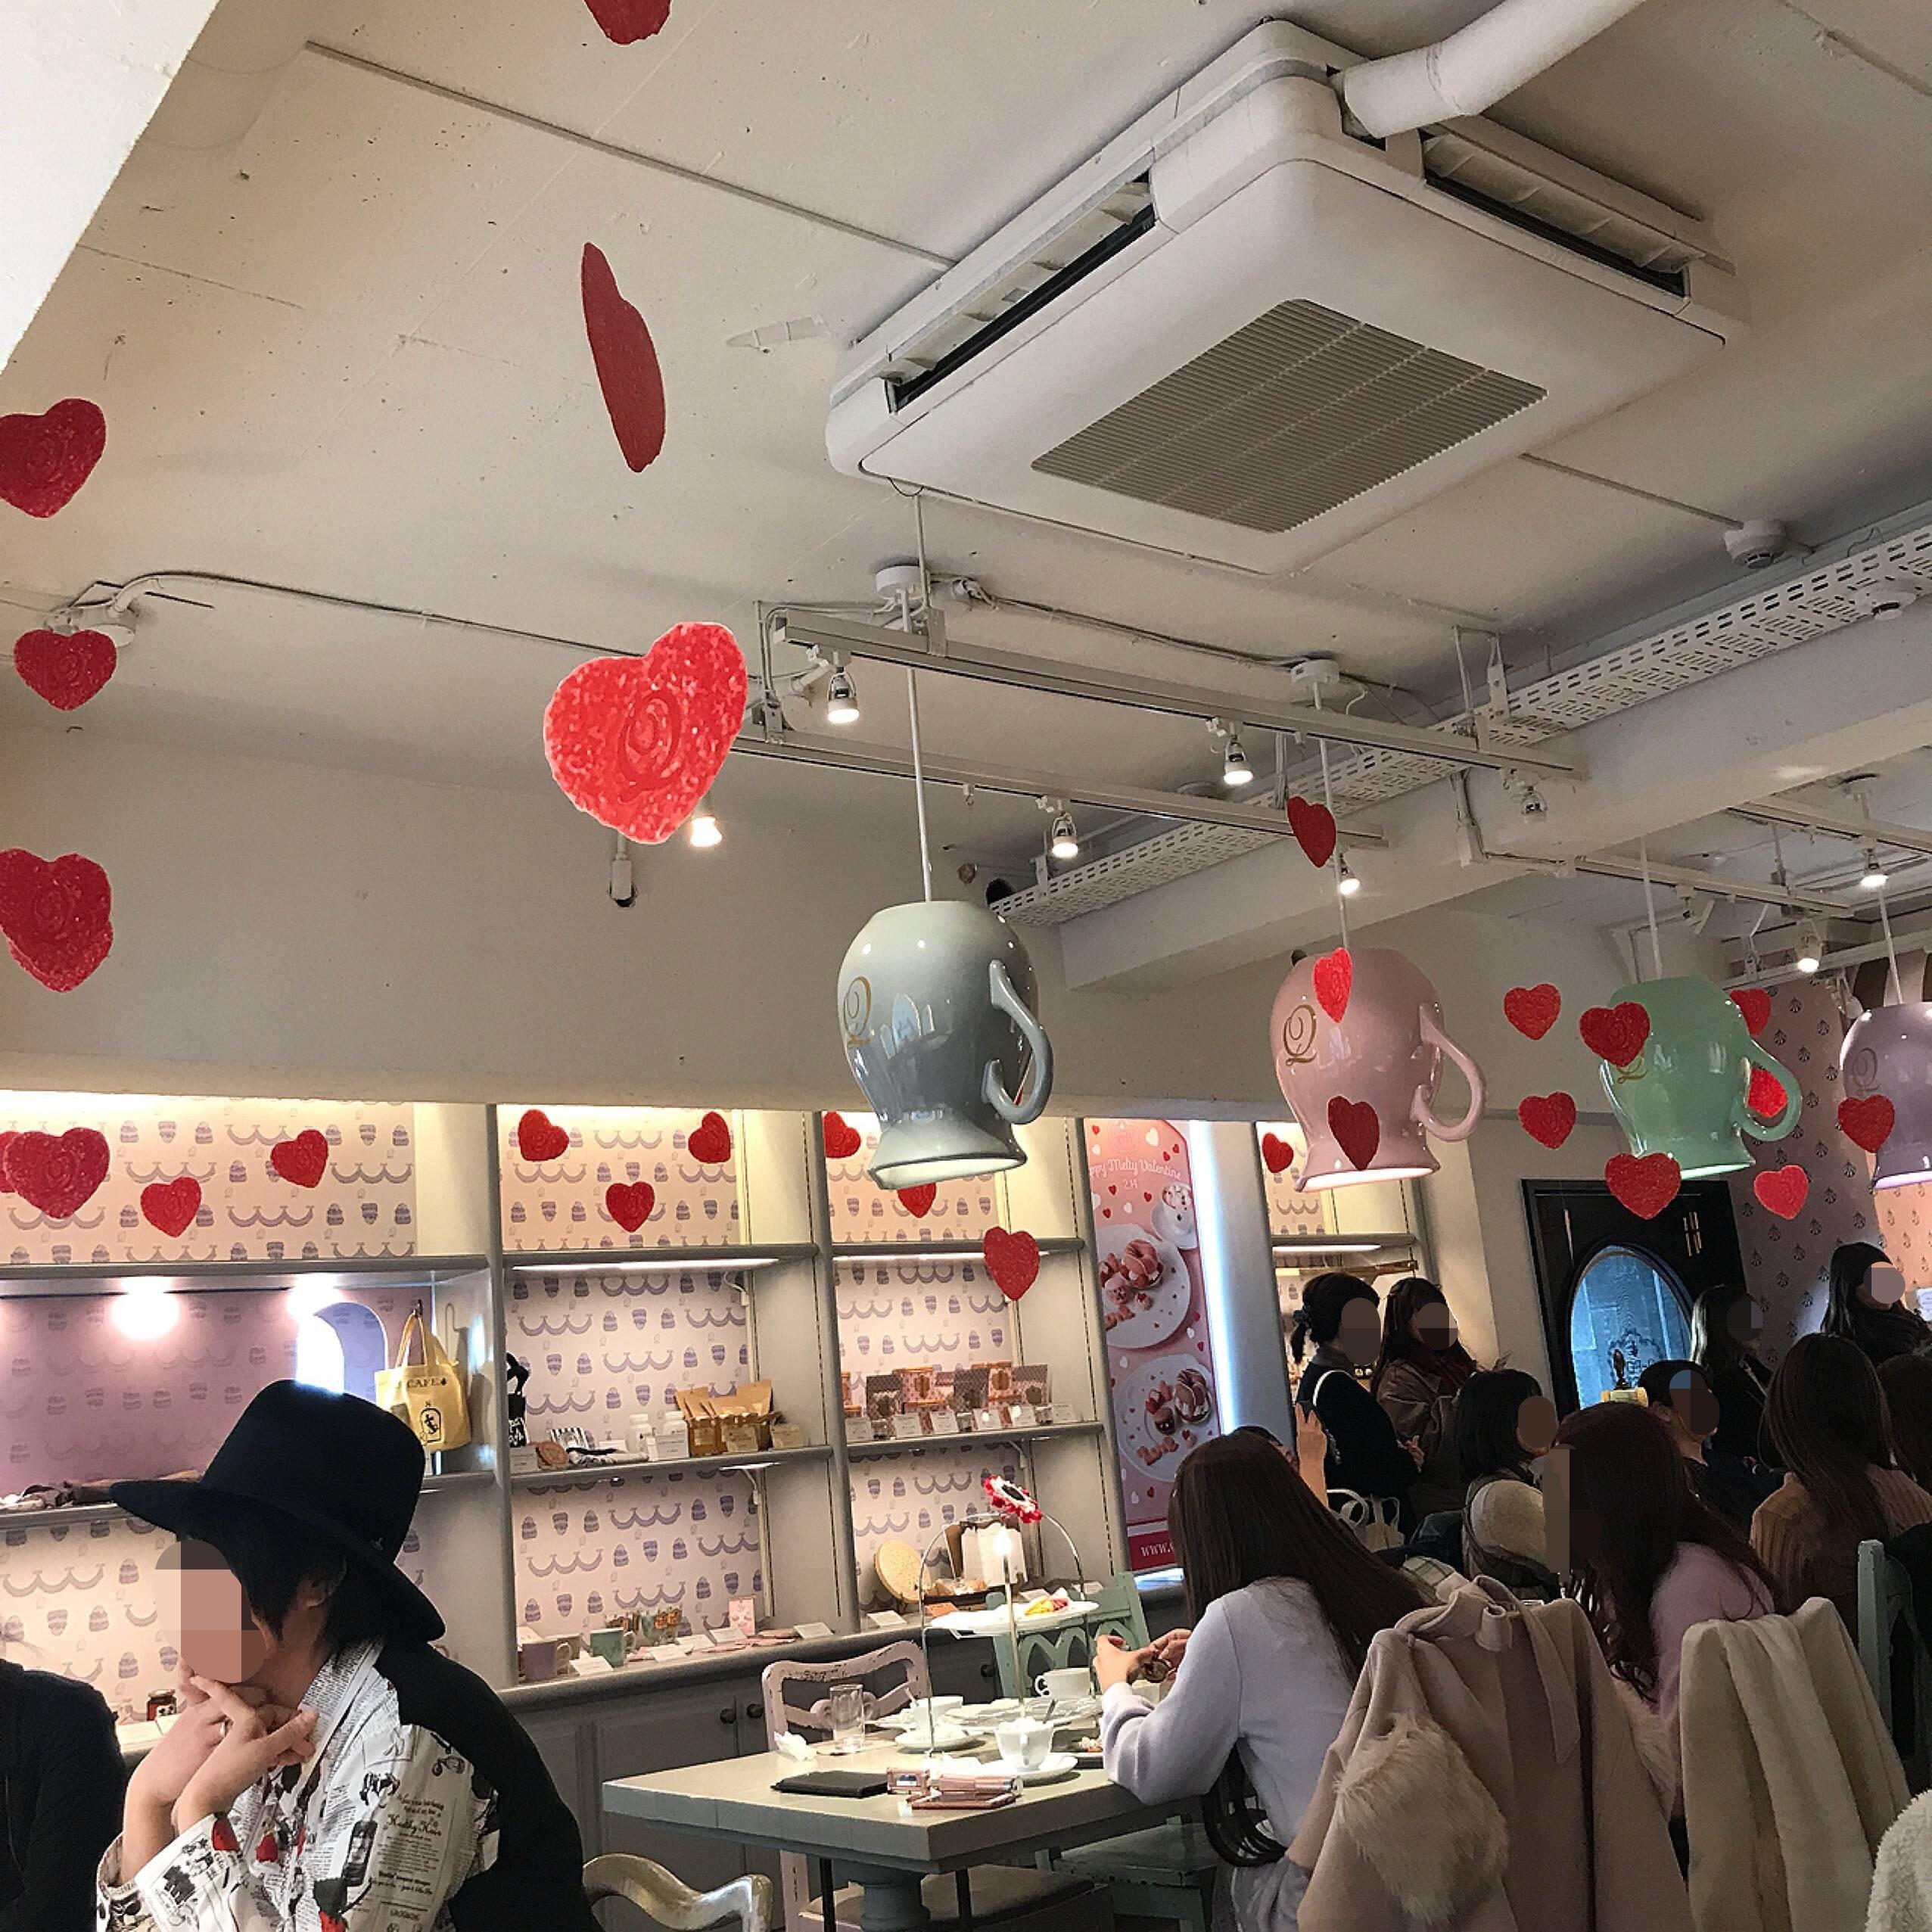 Vol.37♡ 可愛すぎる!Q-pot CAFE.のバレンタイン限定メニュー❤︎_1_2